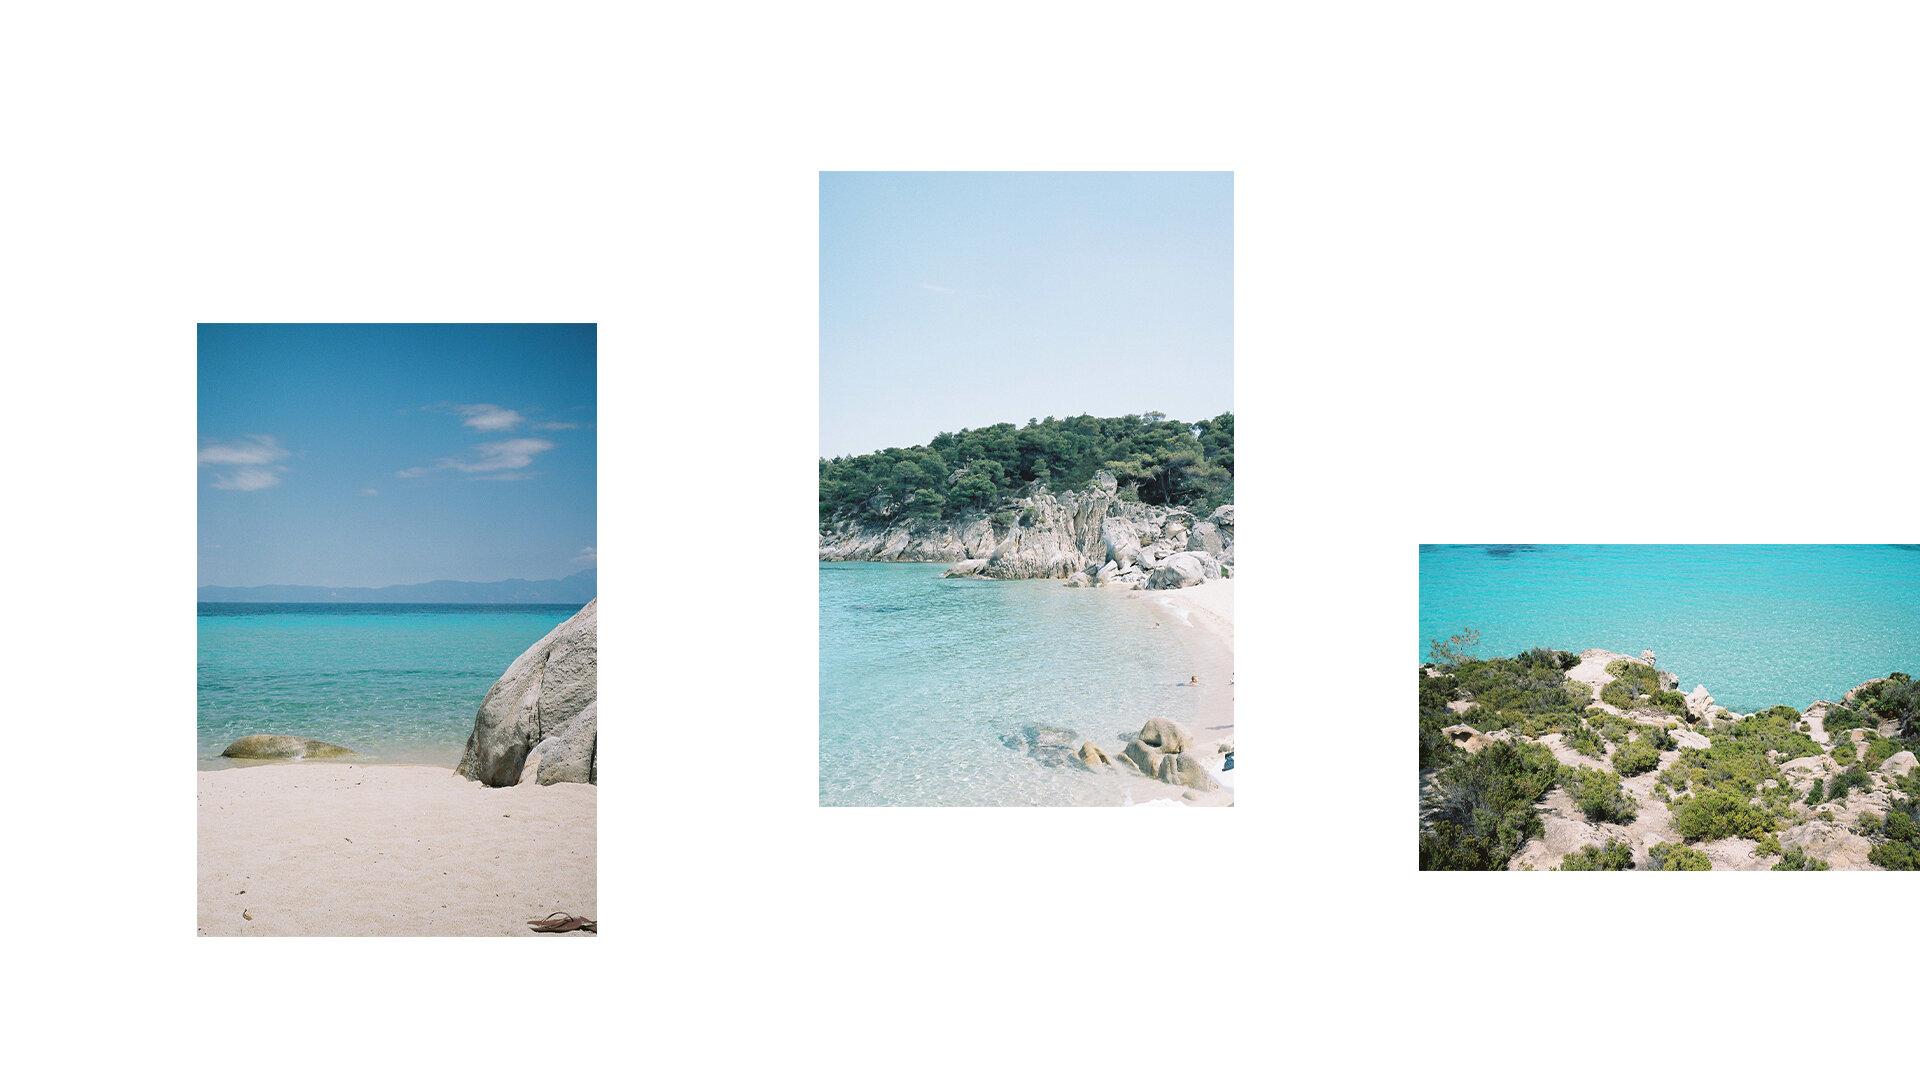 toby-butler-photo-tobybutlerphoto-lifestylephotography-travel-travelphotography-lifestyle-tourism-greece-film-35mm-magazine-europe-mediterranean-ocean-6.jpg